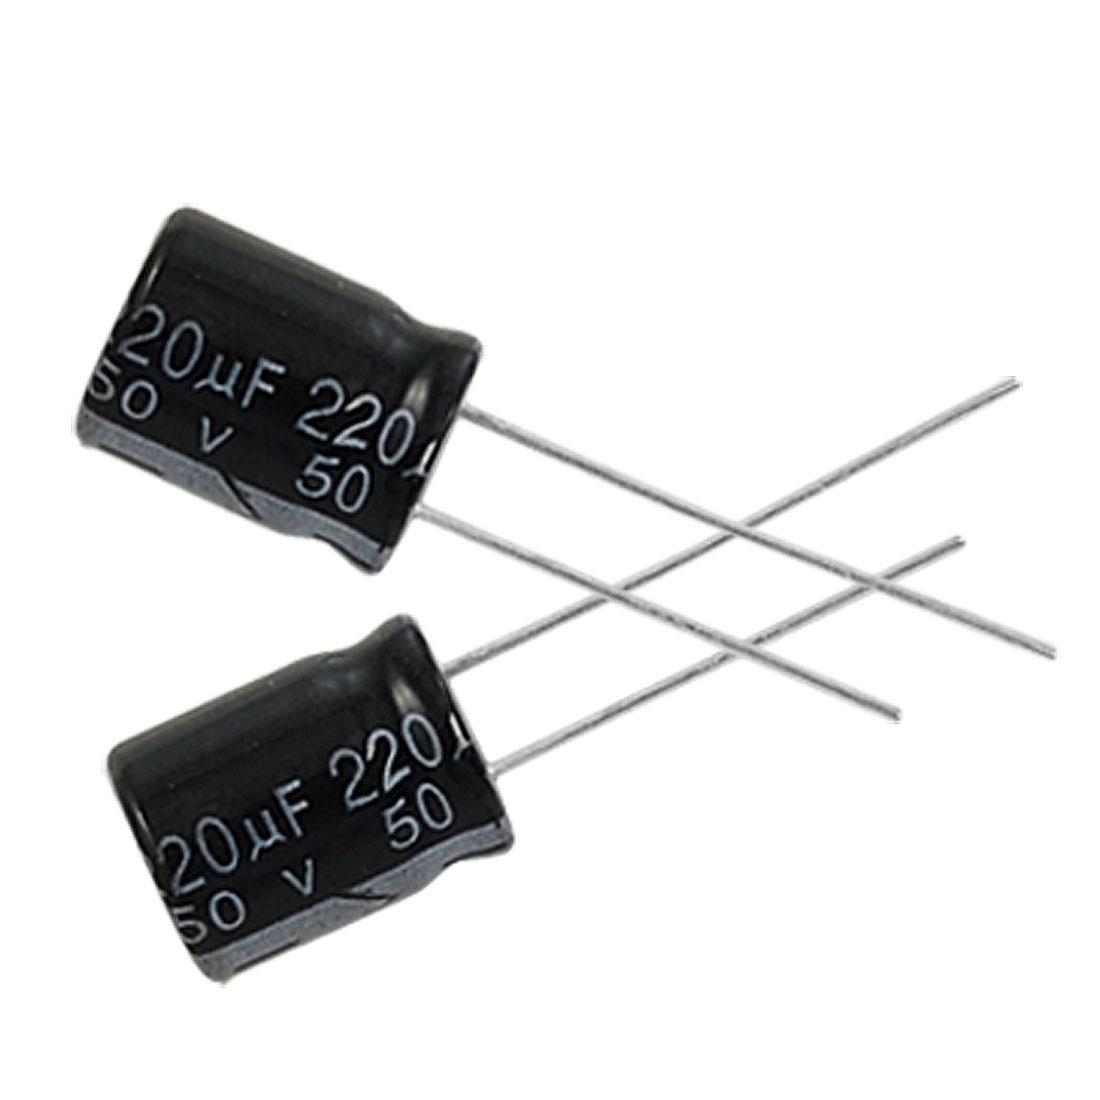 15 x 220uF 50V 105C Radial Electrolytic Capacitor 10x13mm